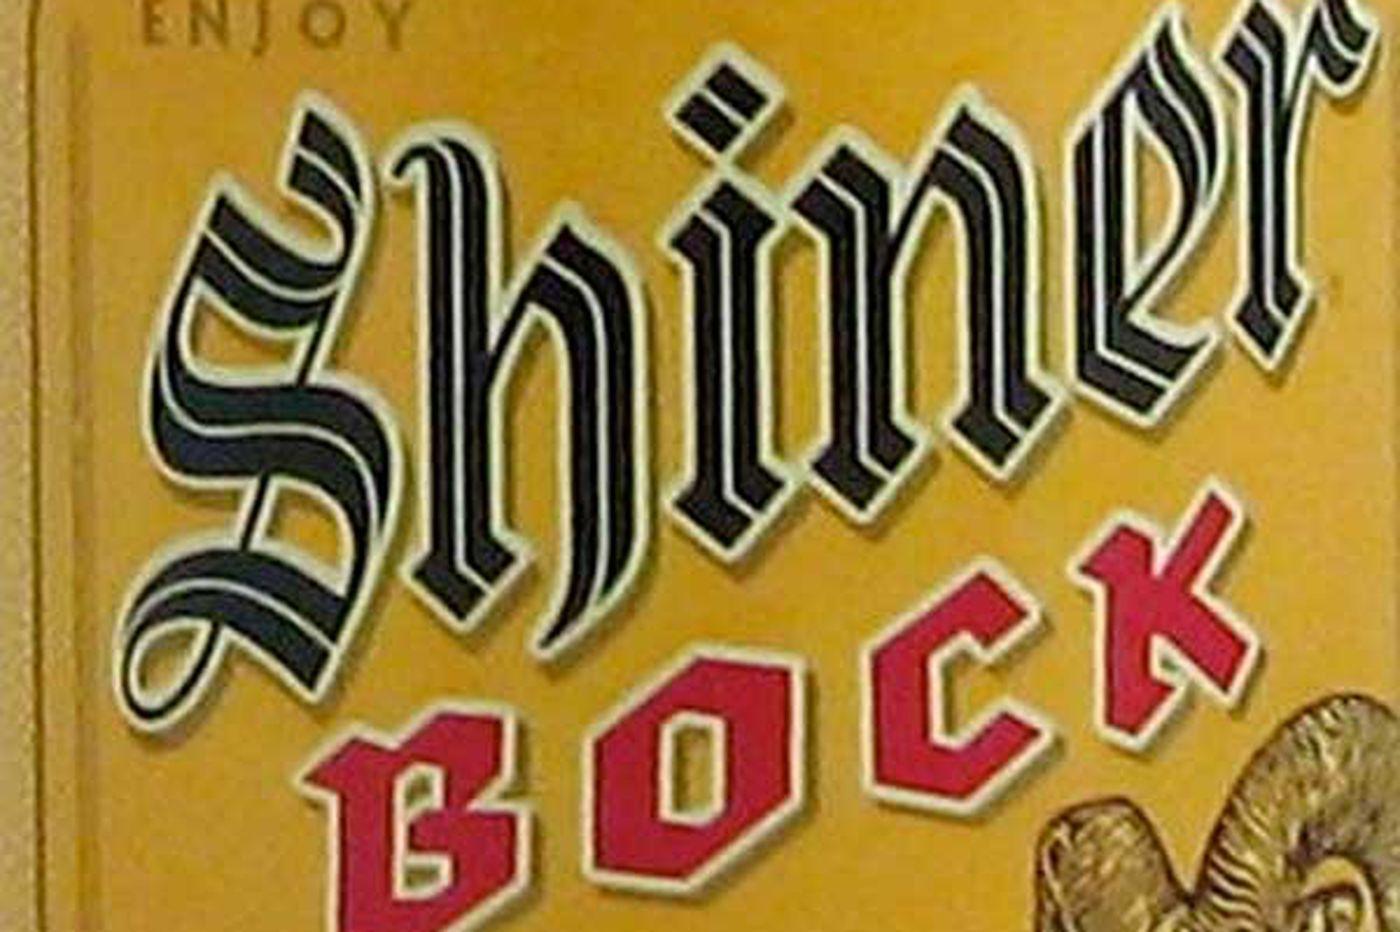 Joe Sixpack takes a shine to Shiner Bock